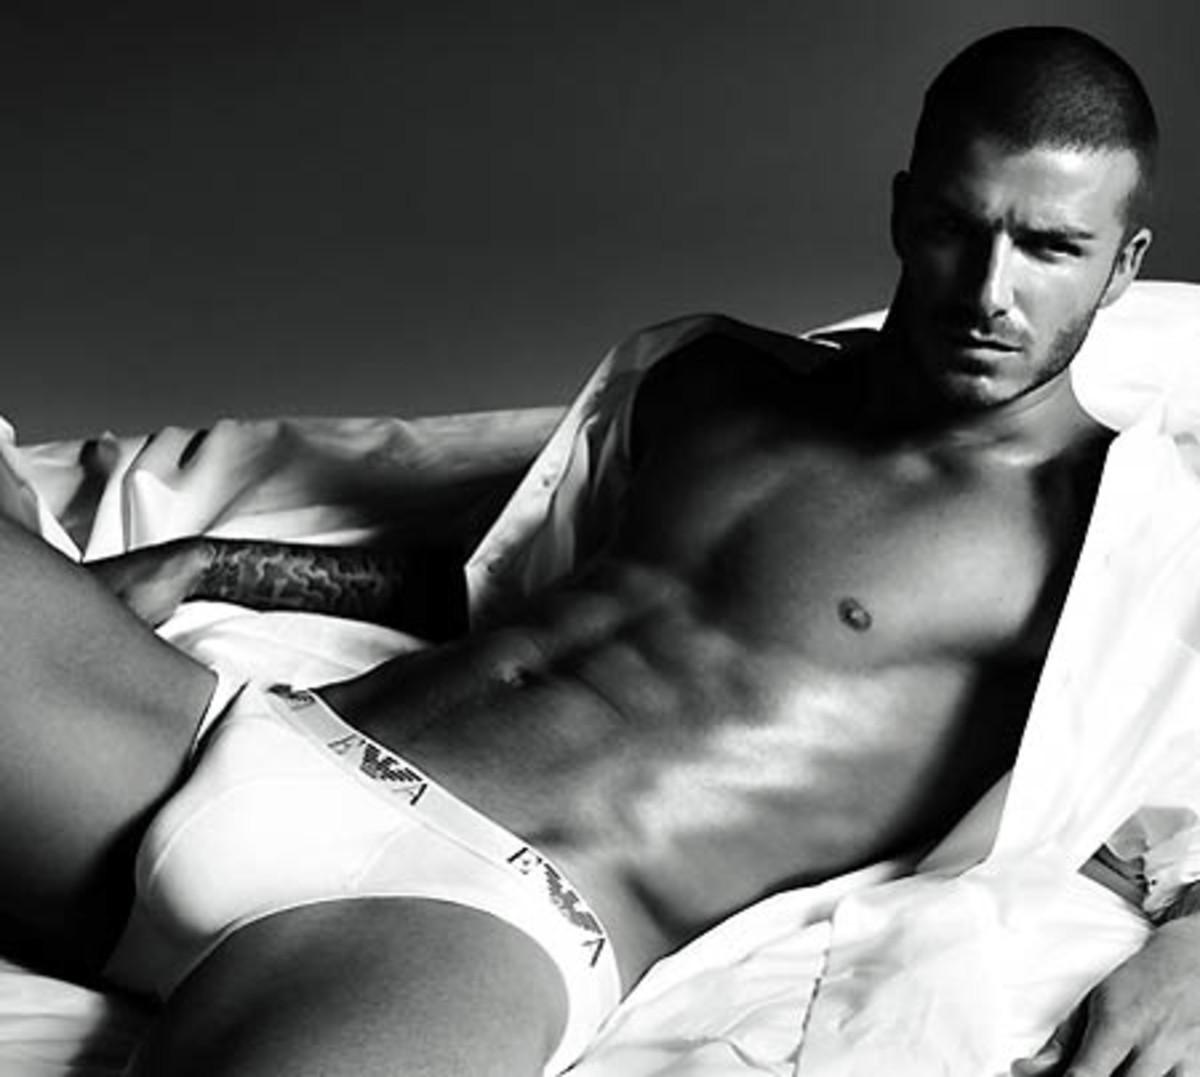 David Beckham_bodywear_Armani underwear campaign